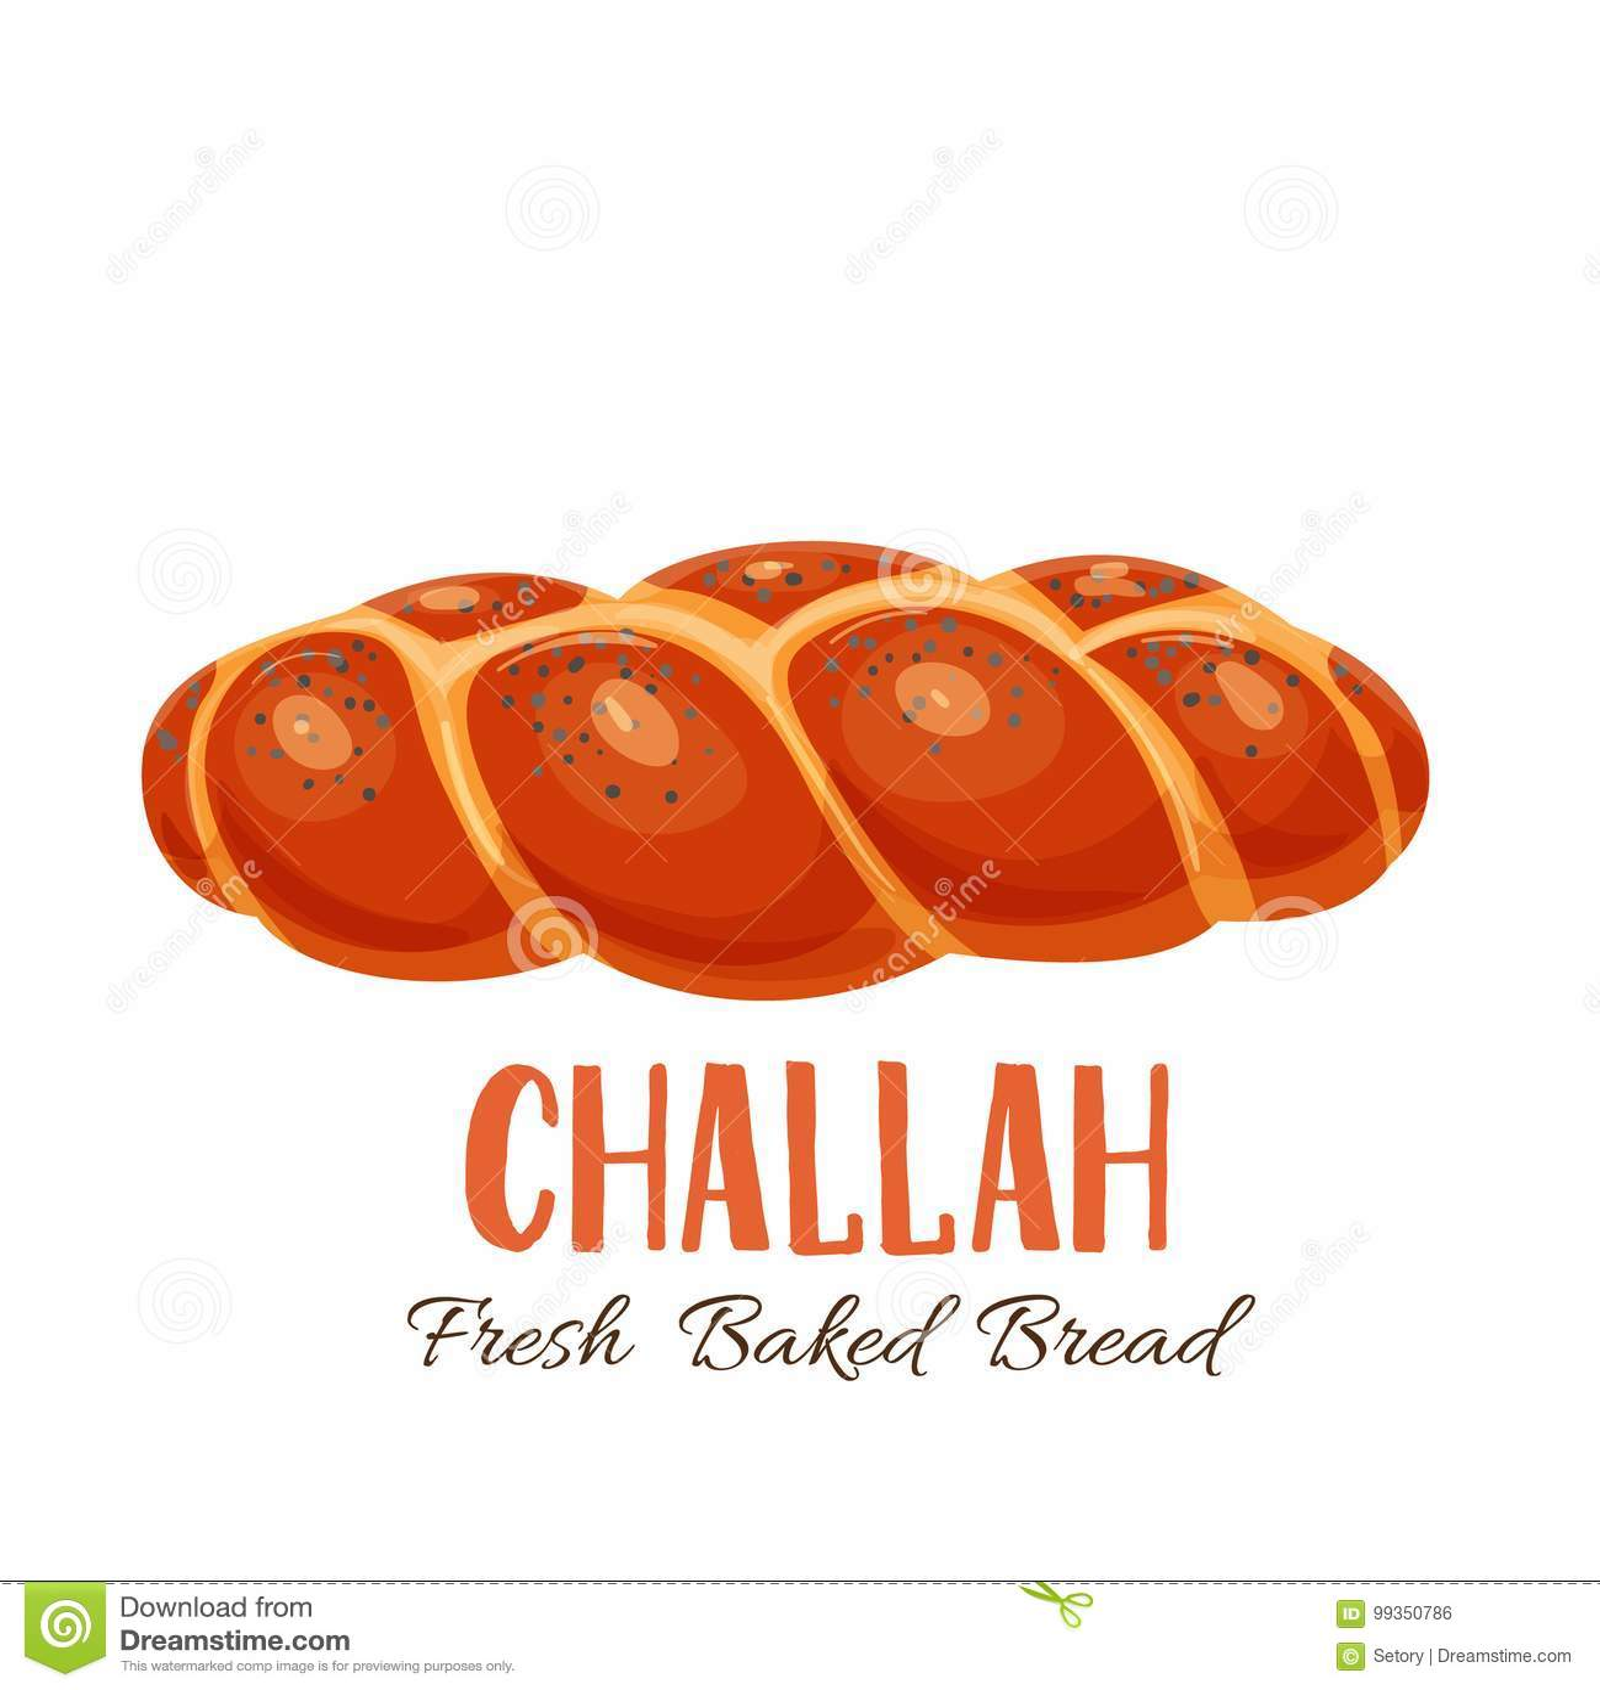 Challah bread icon